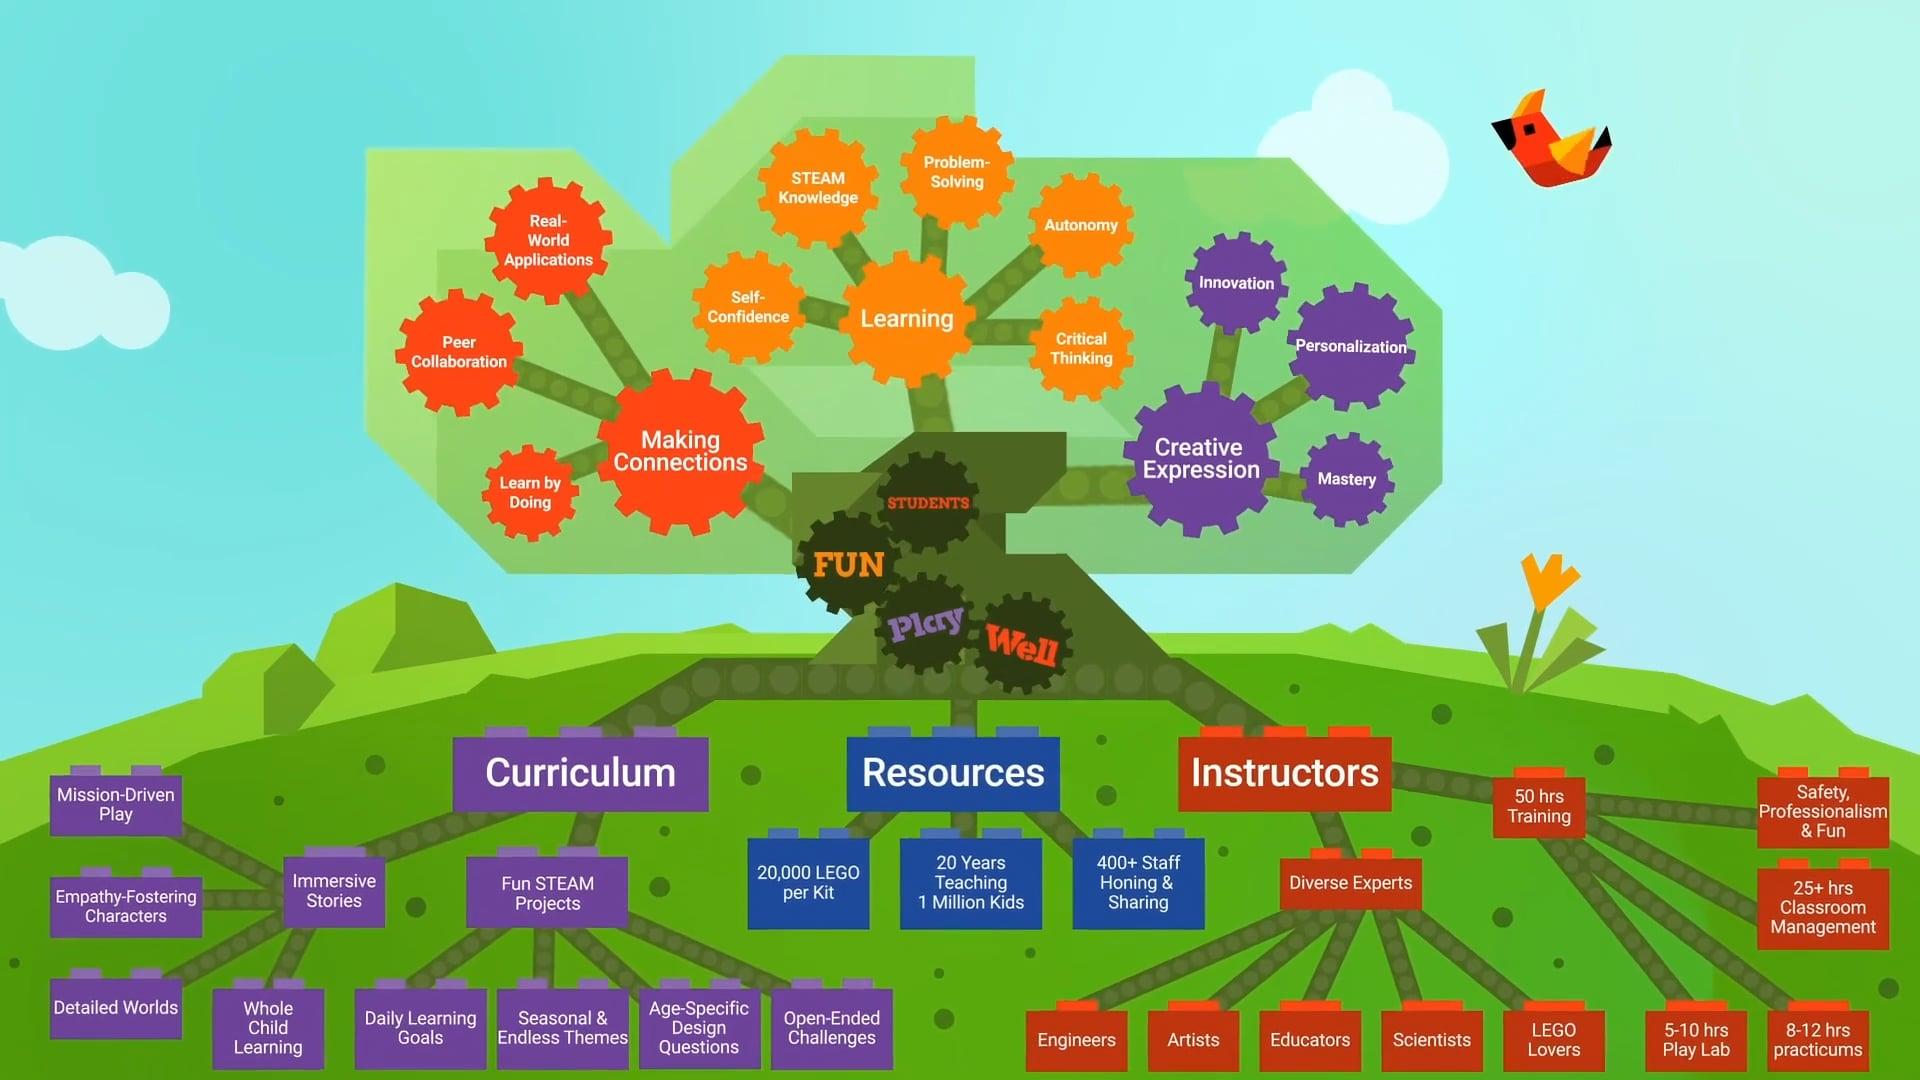 Inside Play-Well's Curriculum